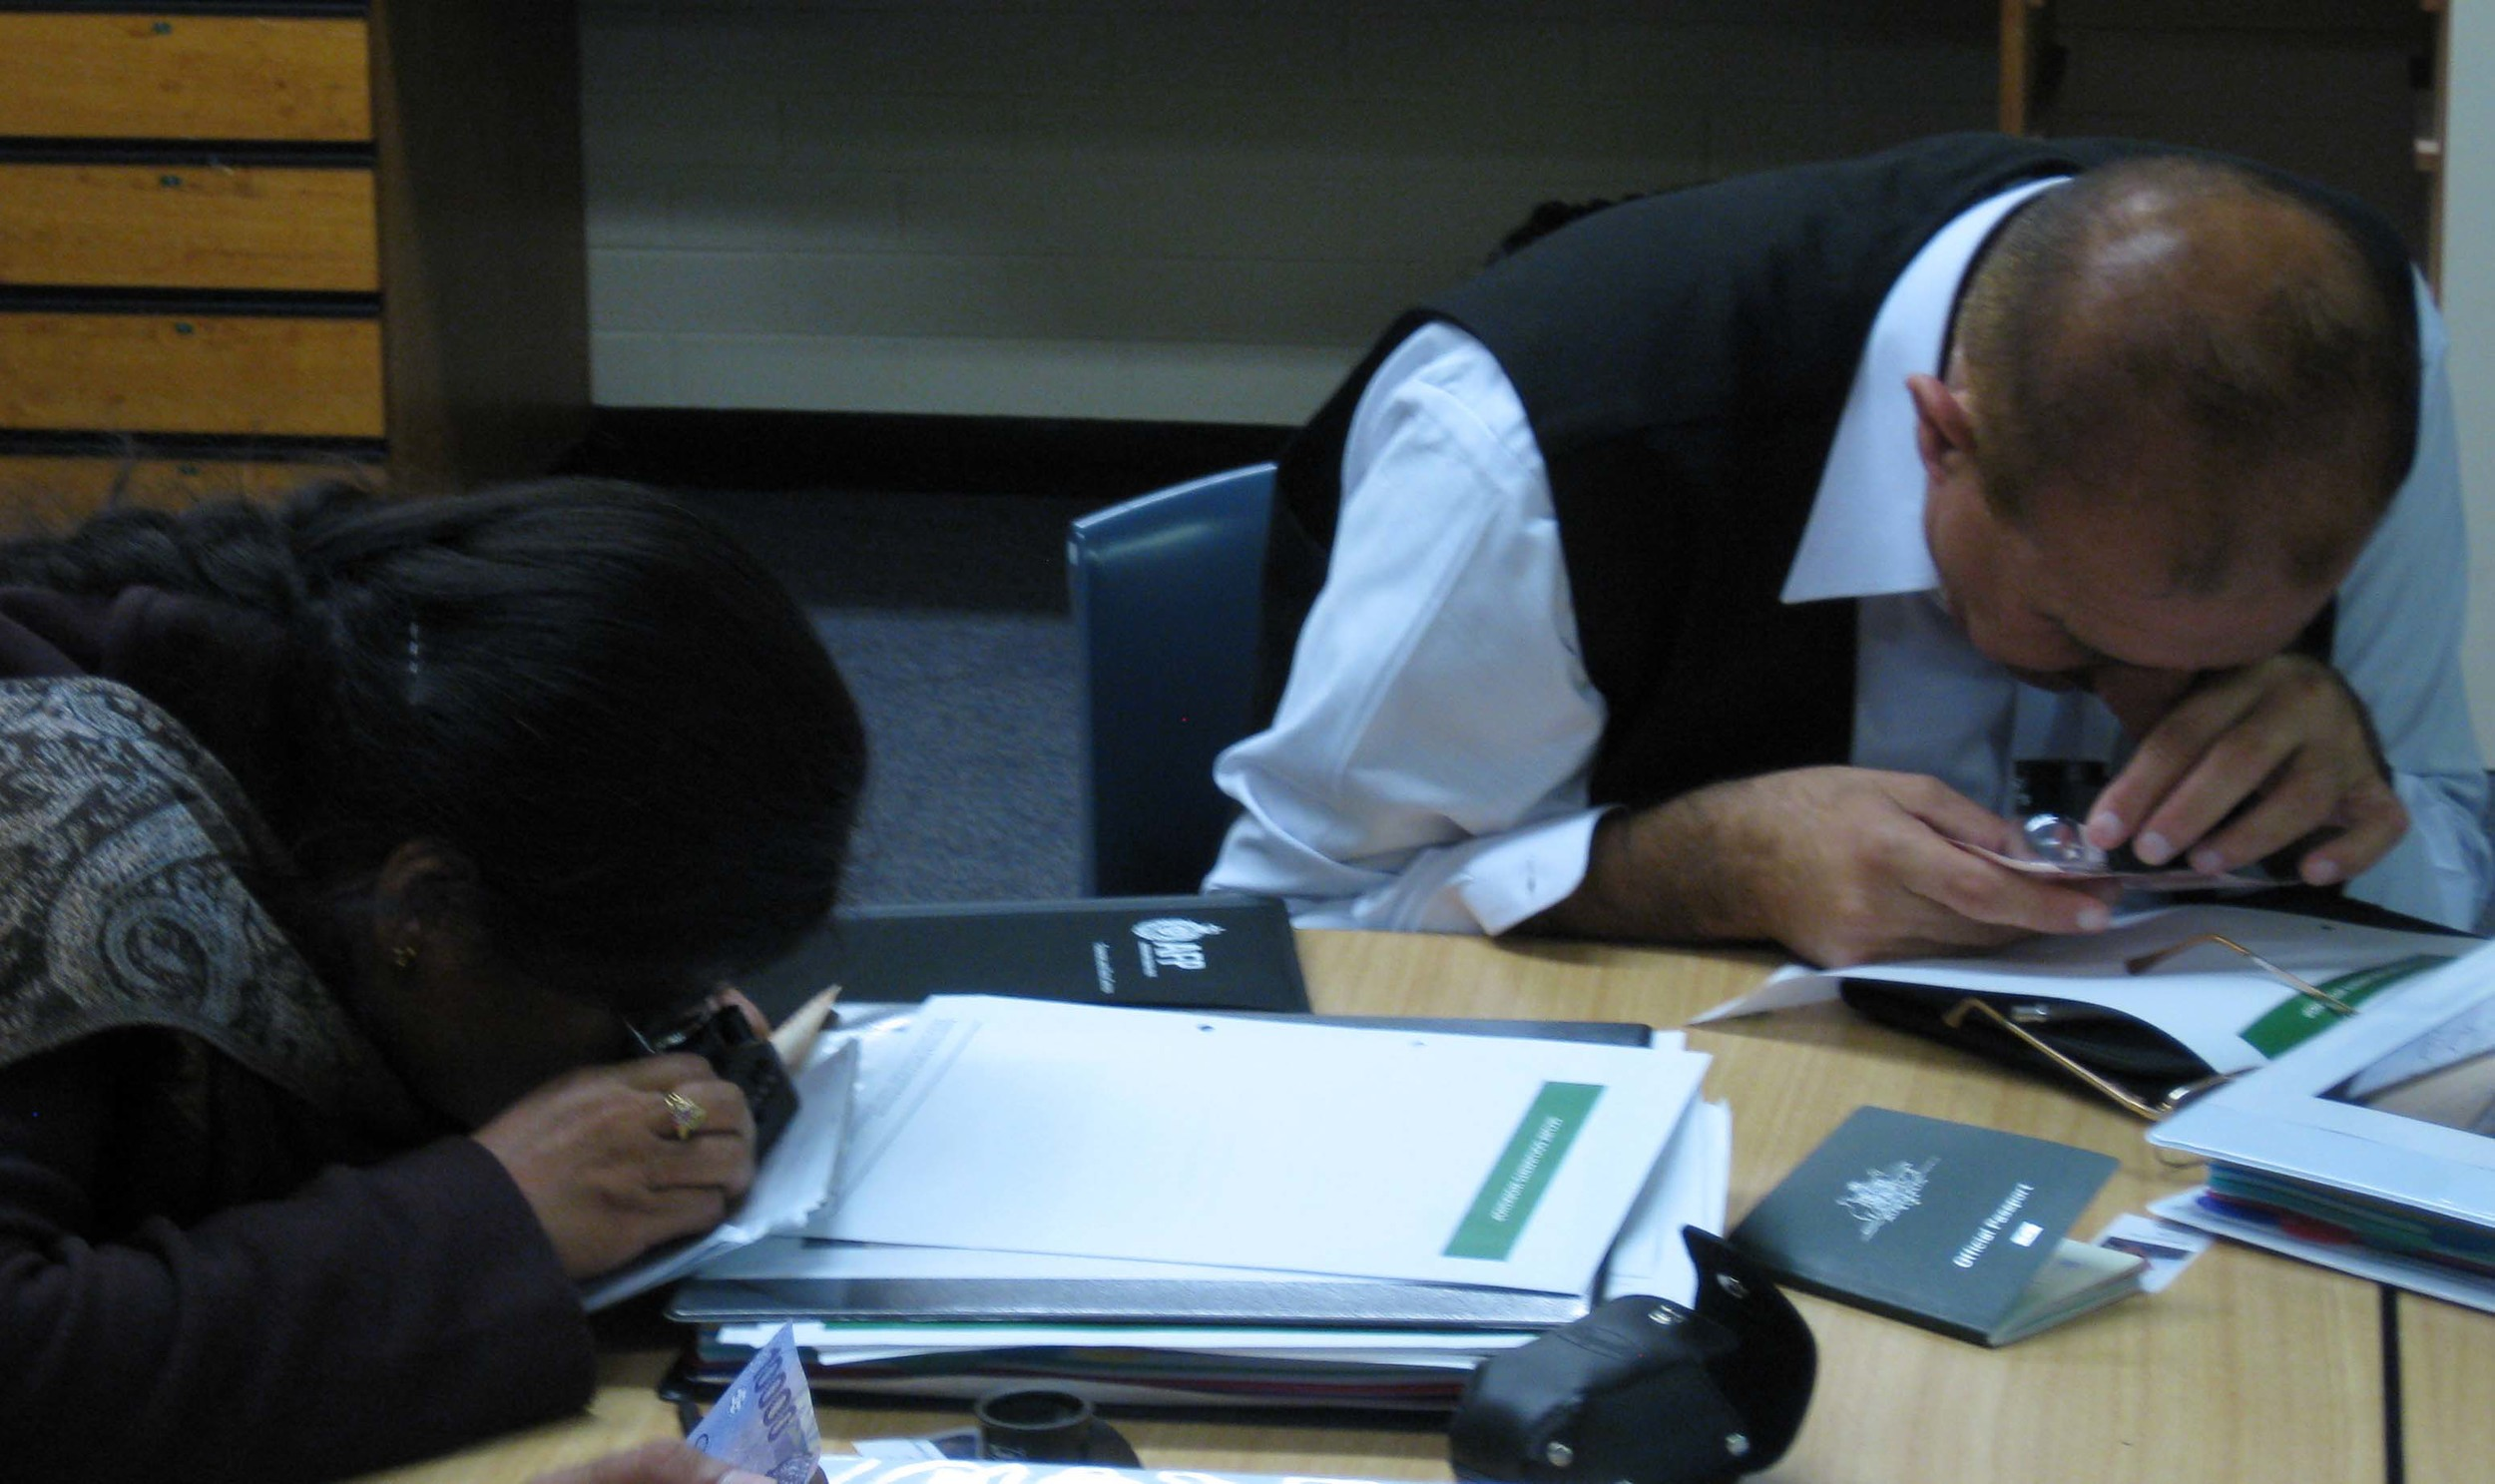 security document examination workshop.jpg